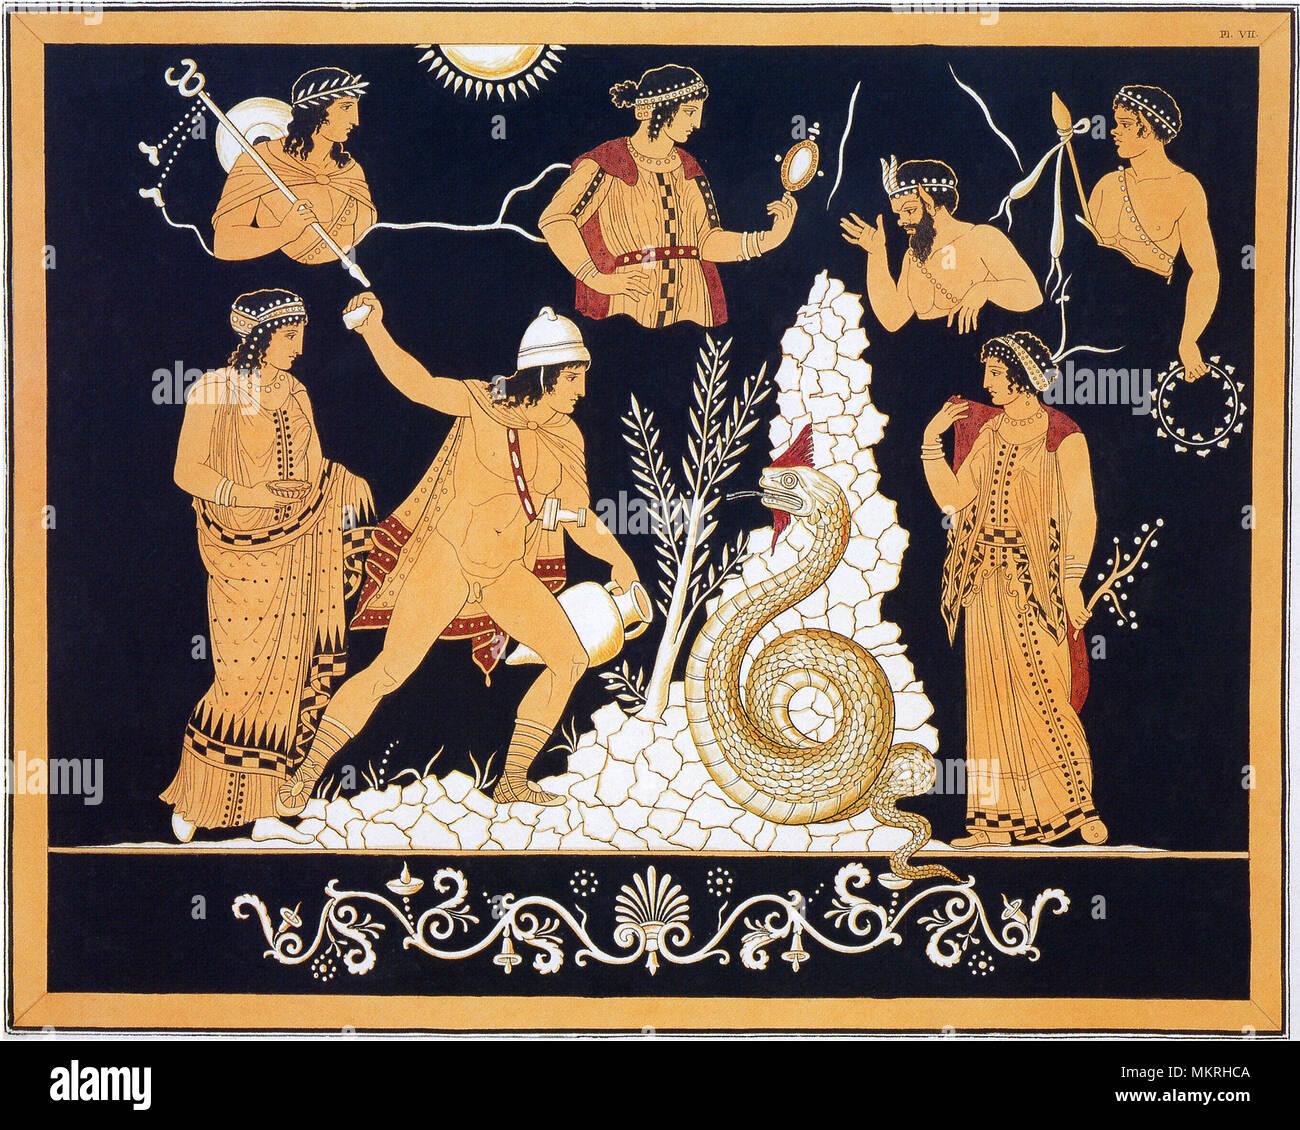 Pittura Etrusca Immagini E Fotos Stock Alamy